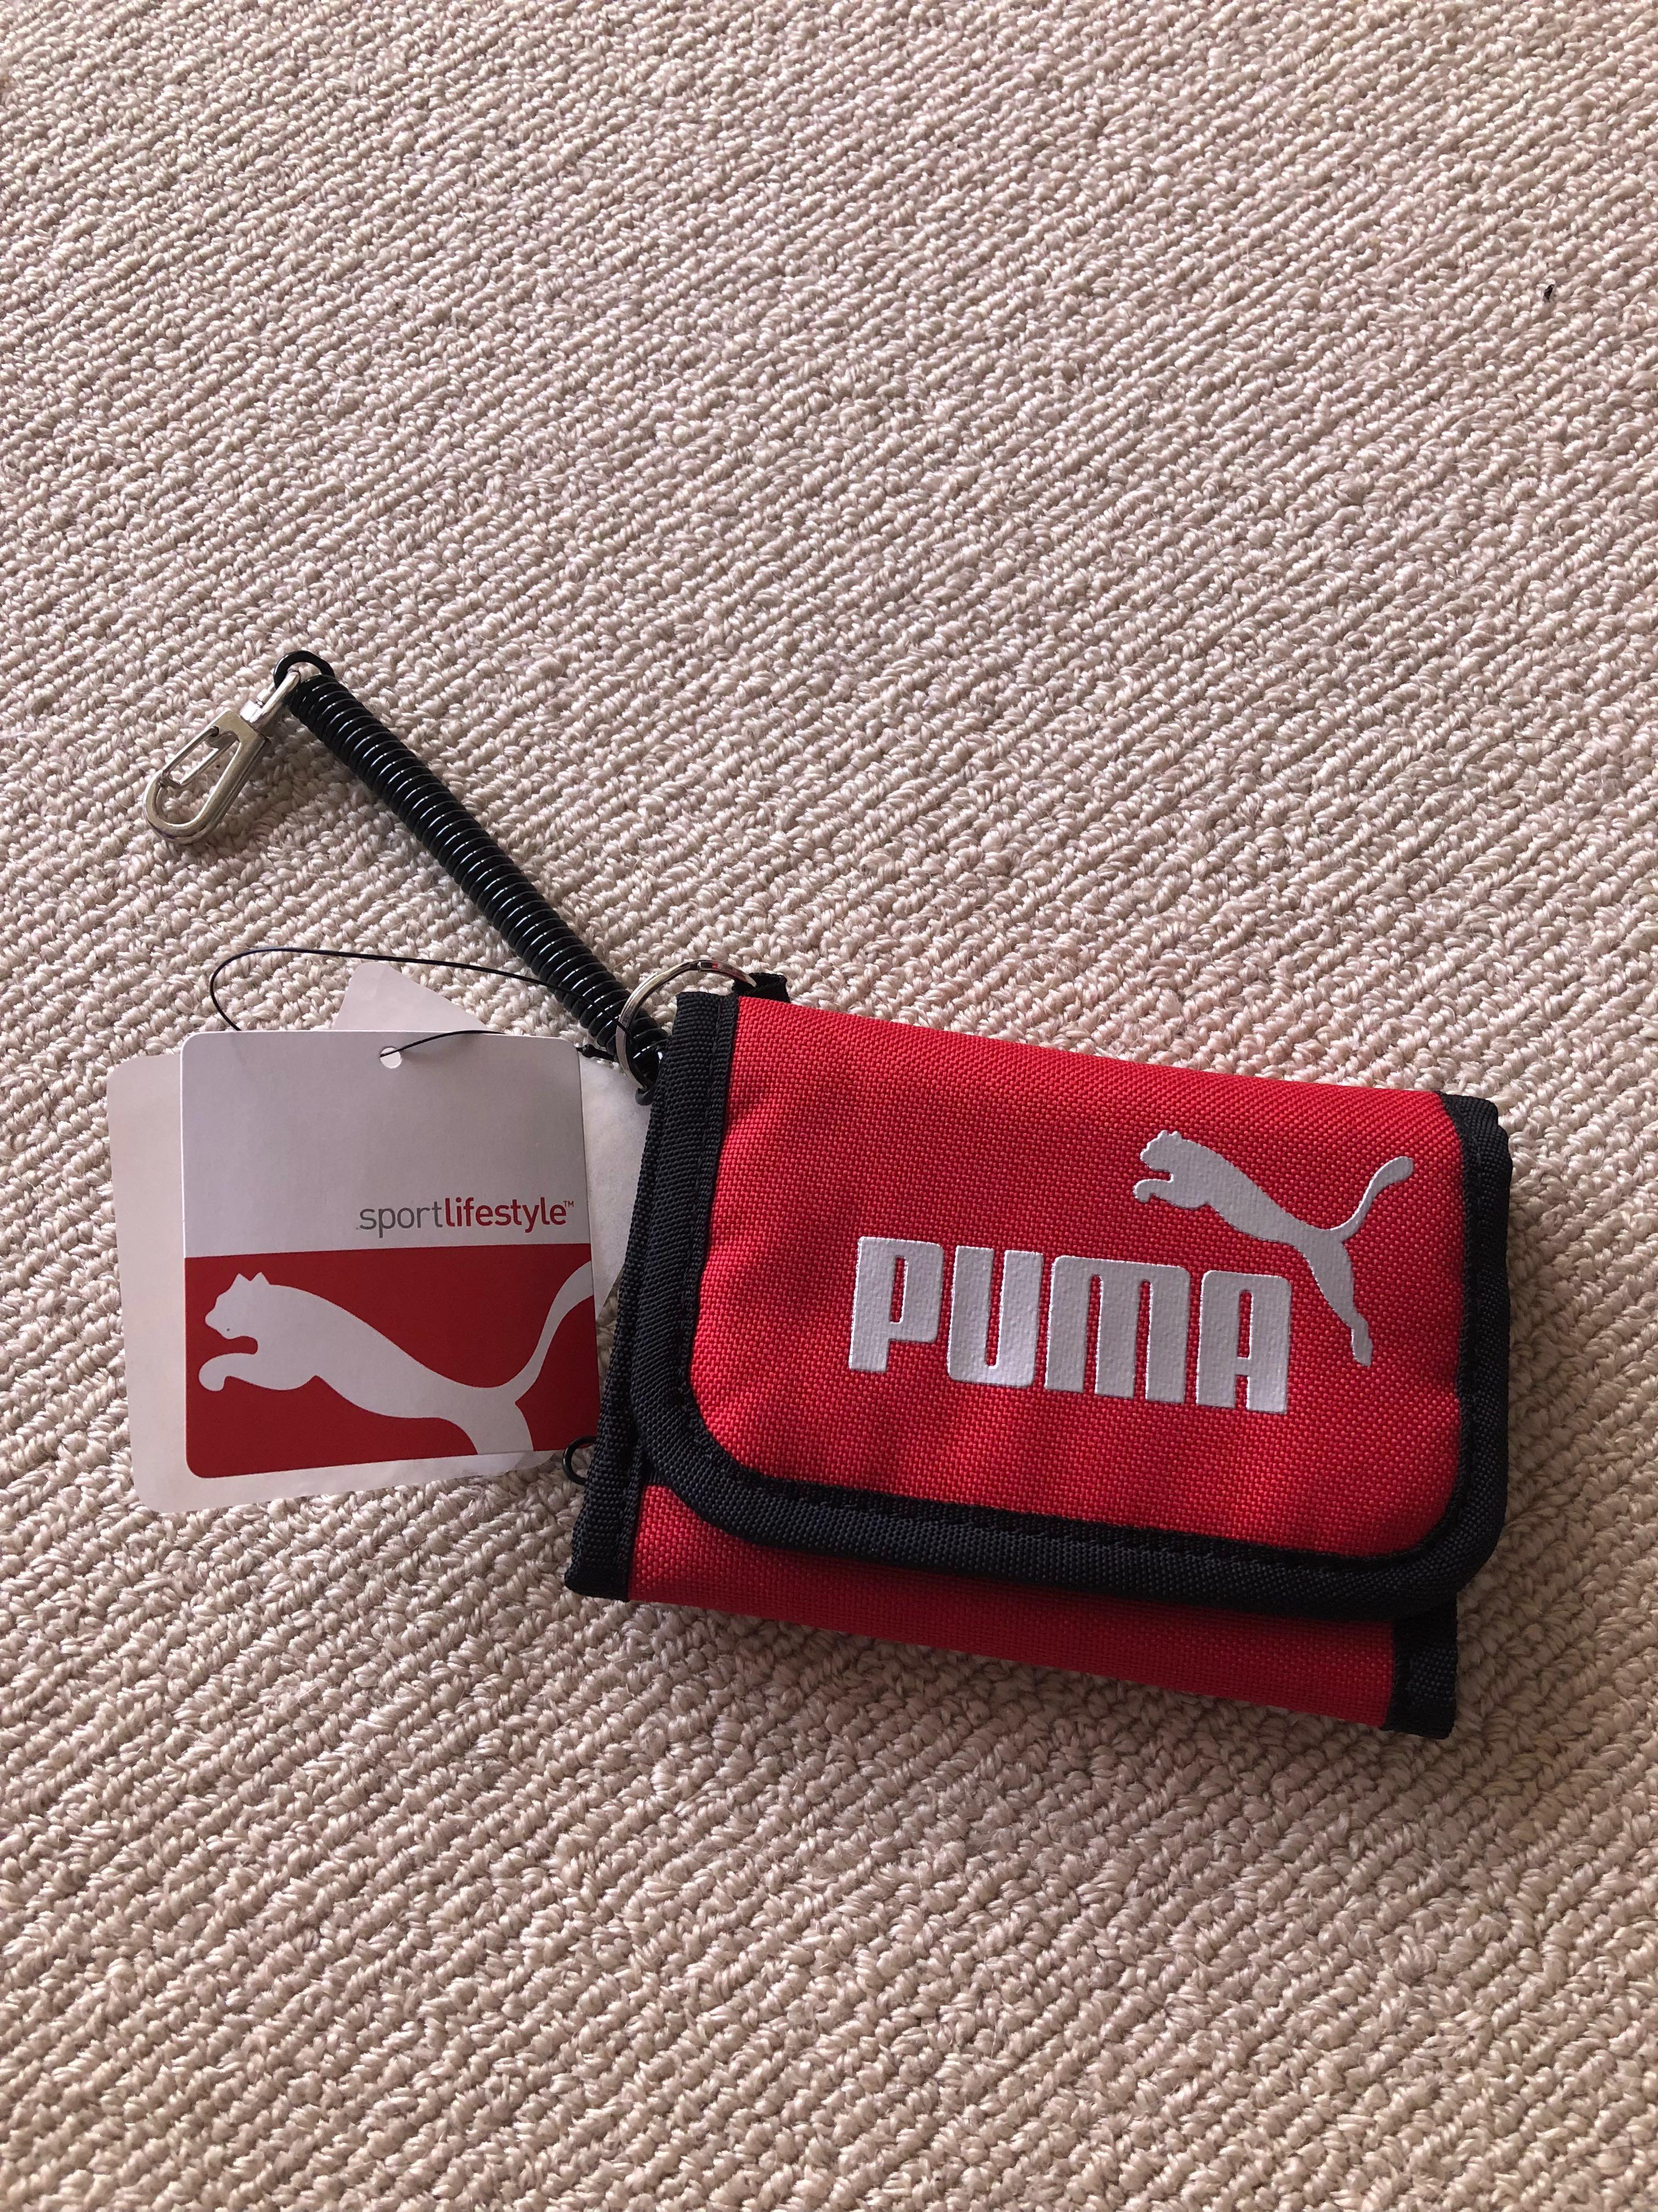 326fc58c79 Brand new Puma men red wallet